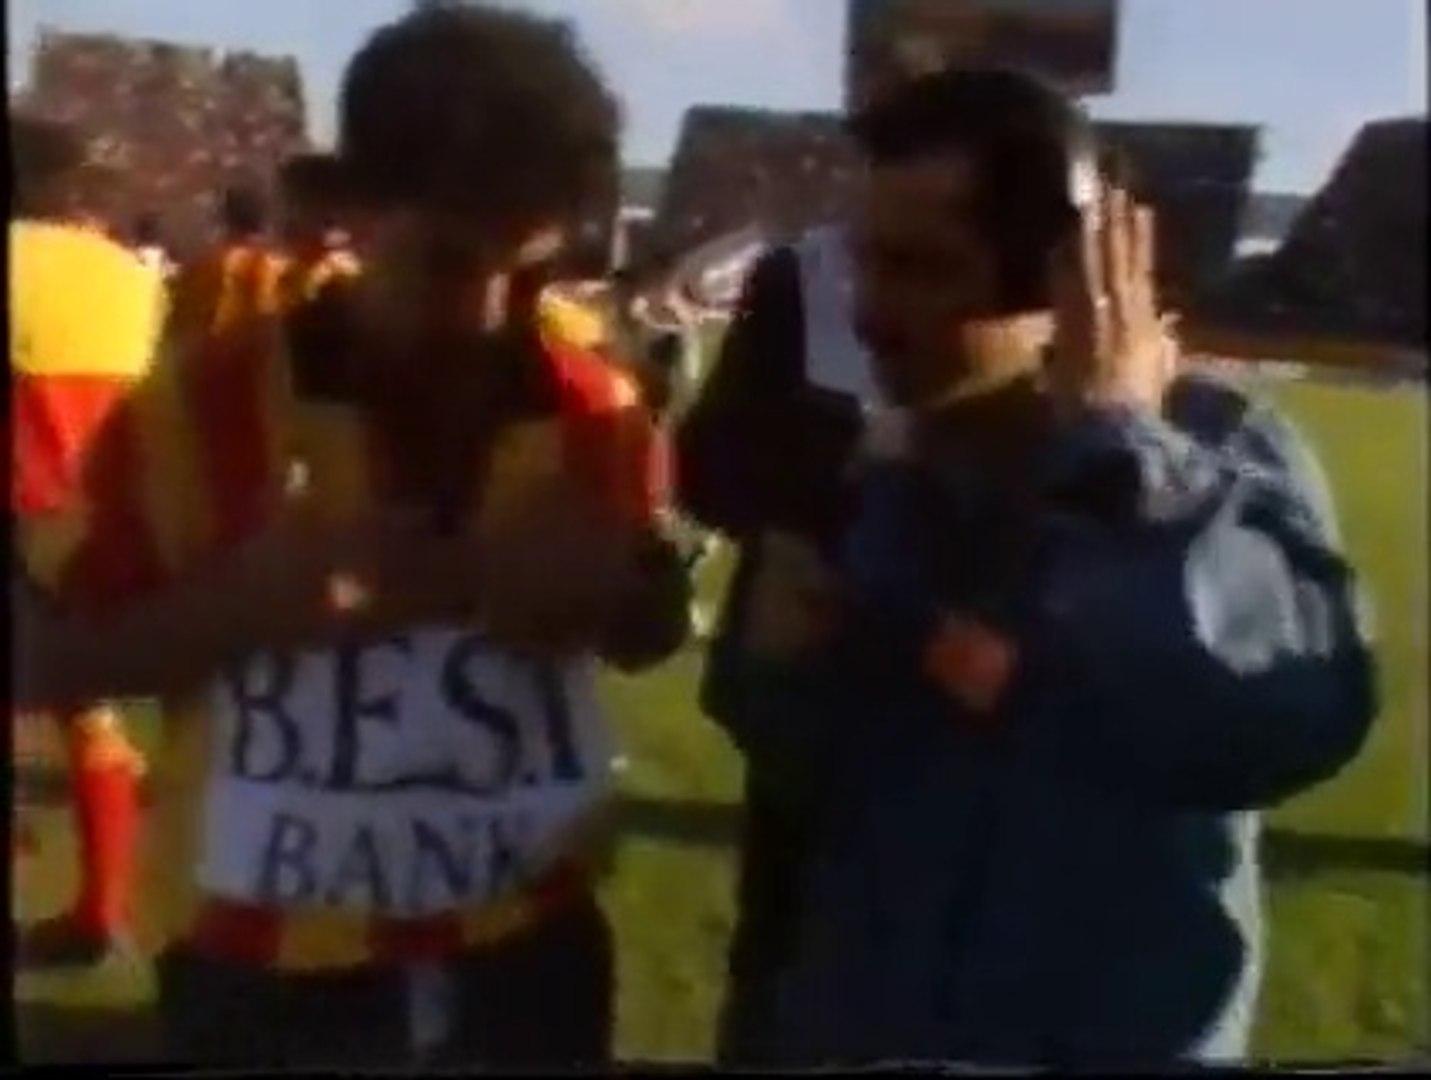 Finale Coupe de Tunisie 1989 Espérance Sportive de Tunis 2-0 Club Africain 24-12-1989 EST vs CA